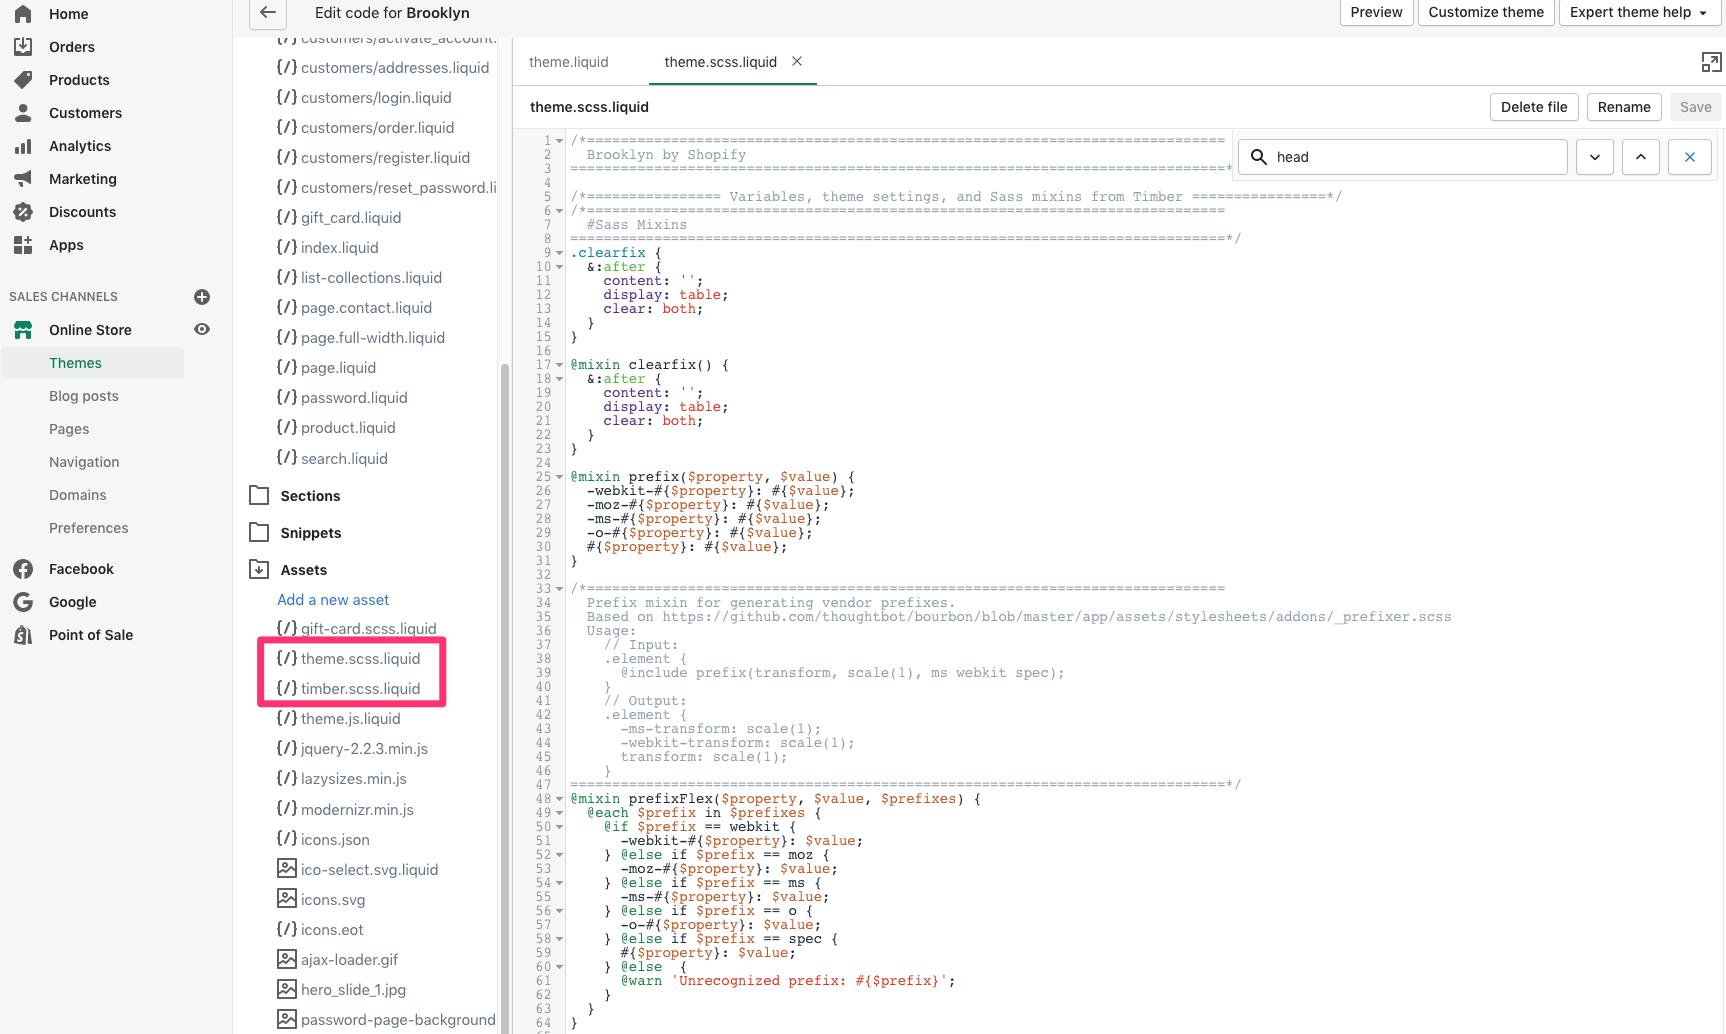 shopify edit code assets